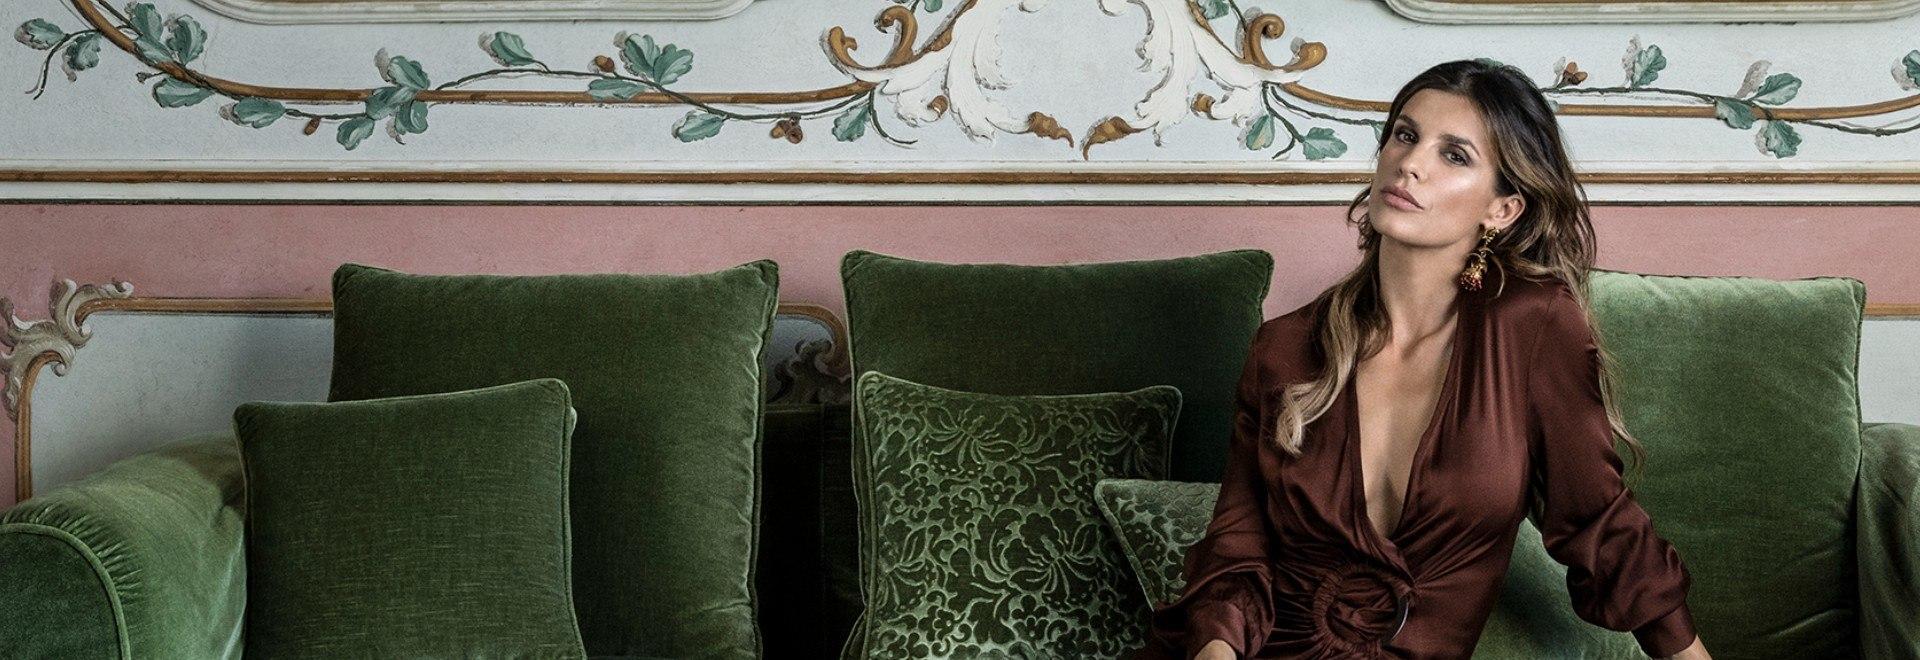 Nicole Kidman, luci e ombre